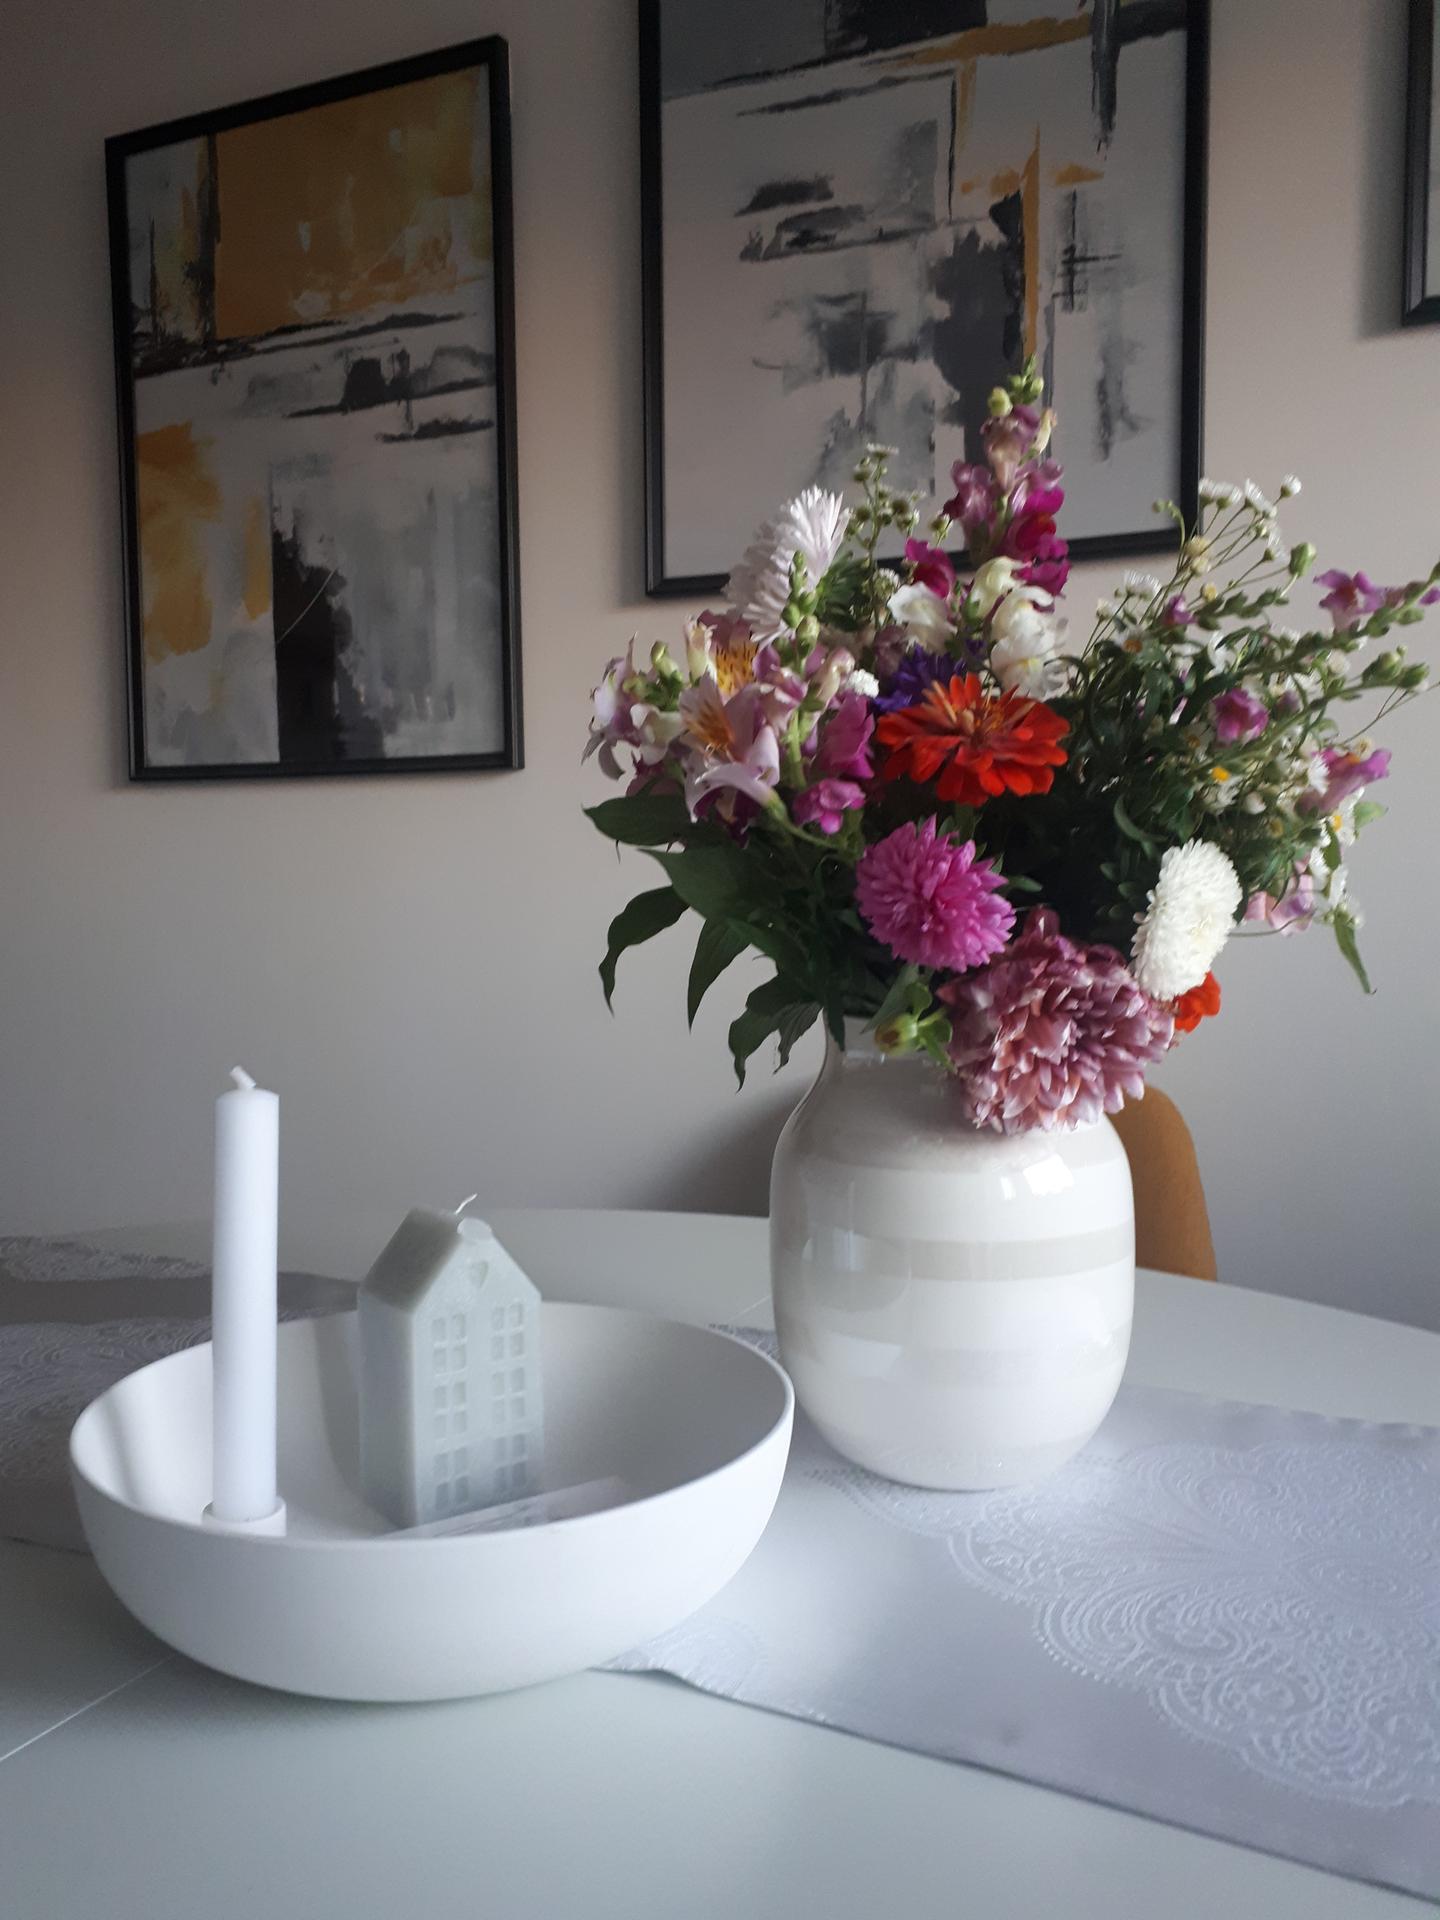 Jeseň u nás doma - Obrázok č. 16